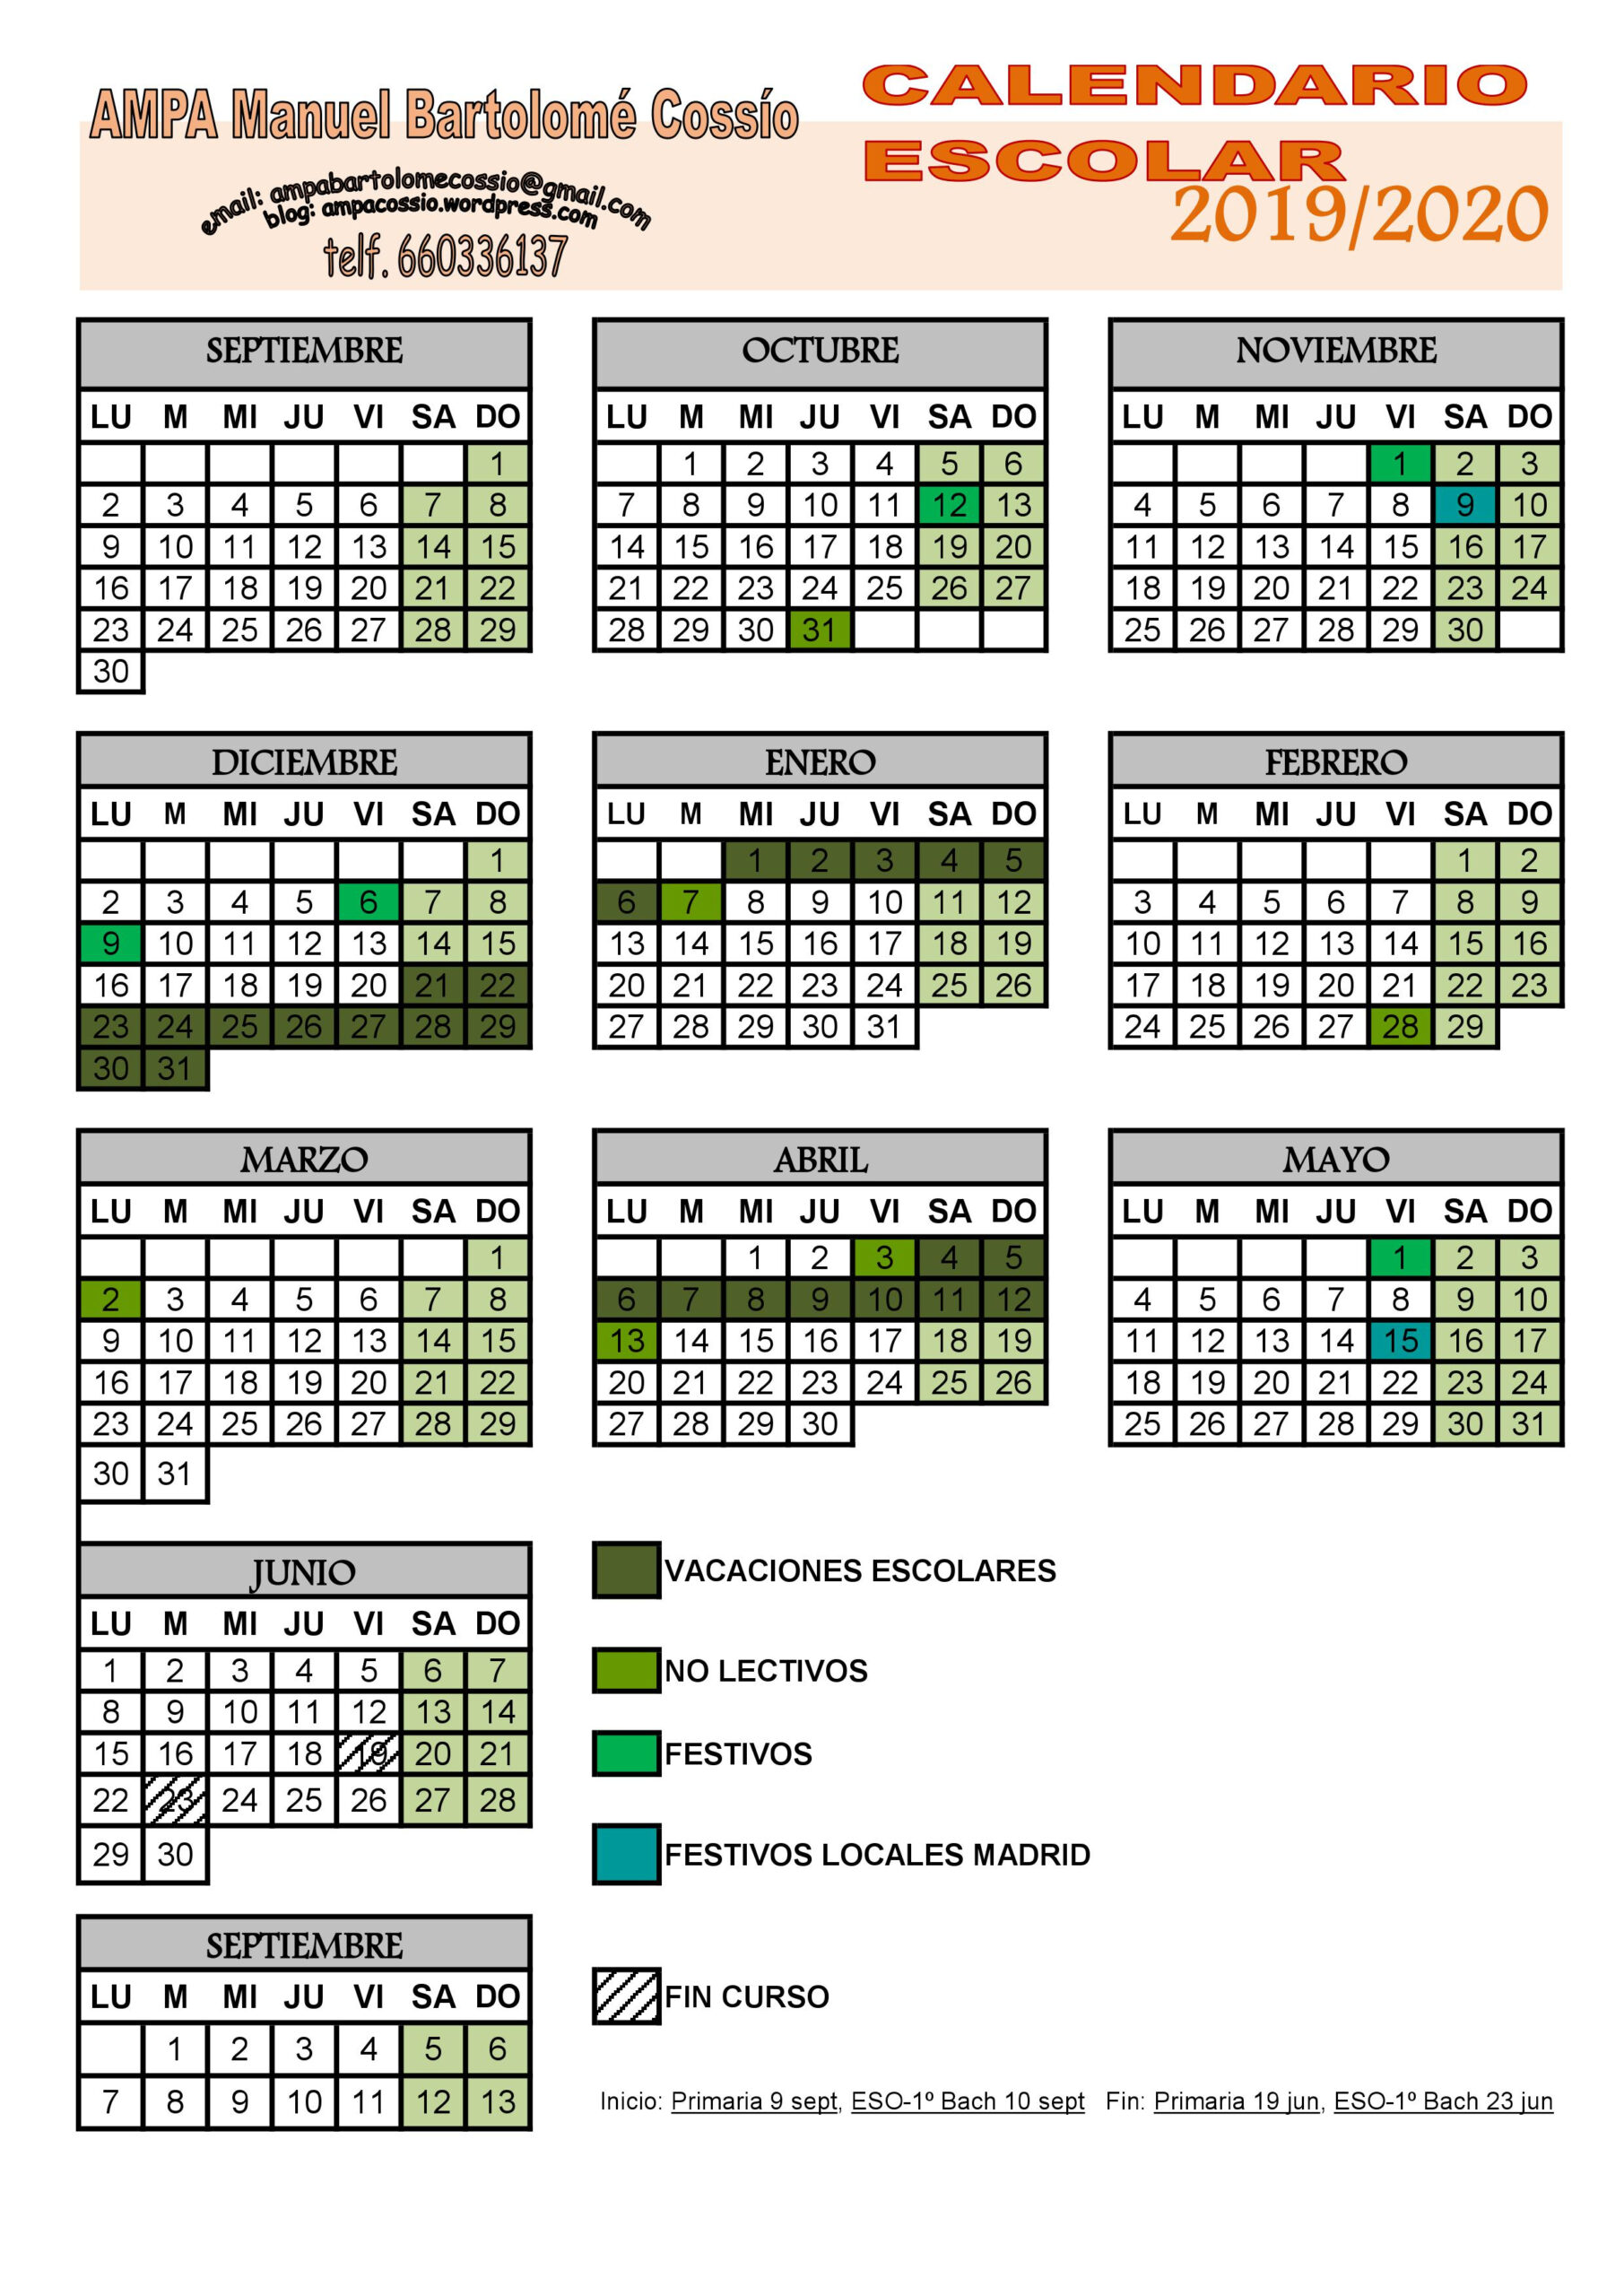 Calendario Escolar 2019-20_Ampa Cossío | Ampacossio with Calendario Escolar WordPress